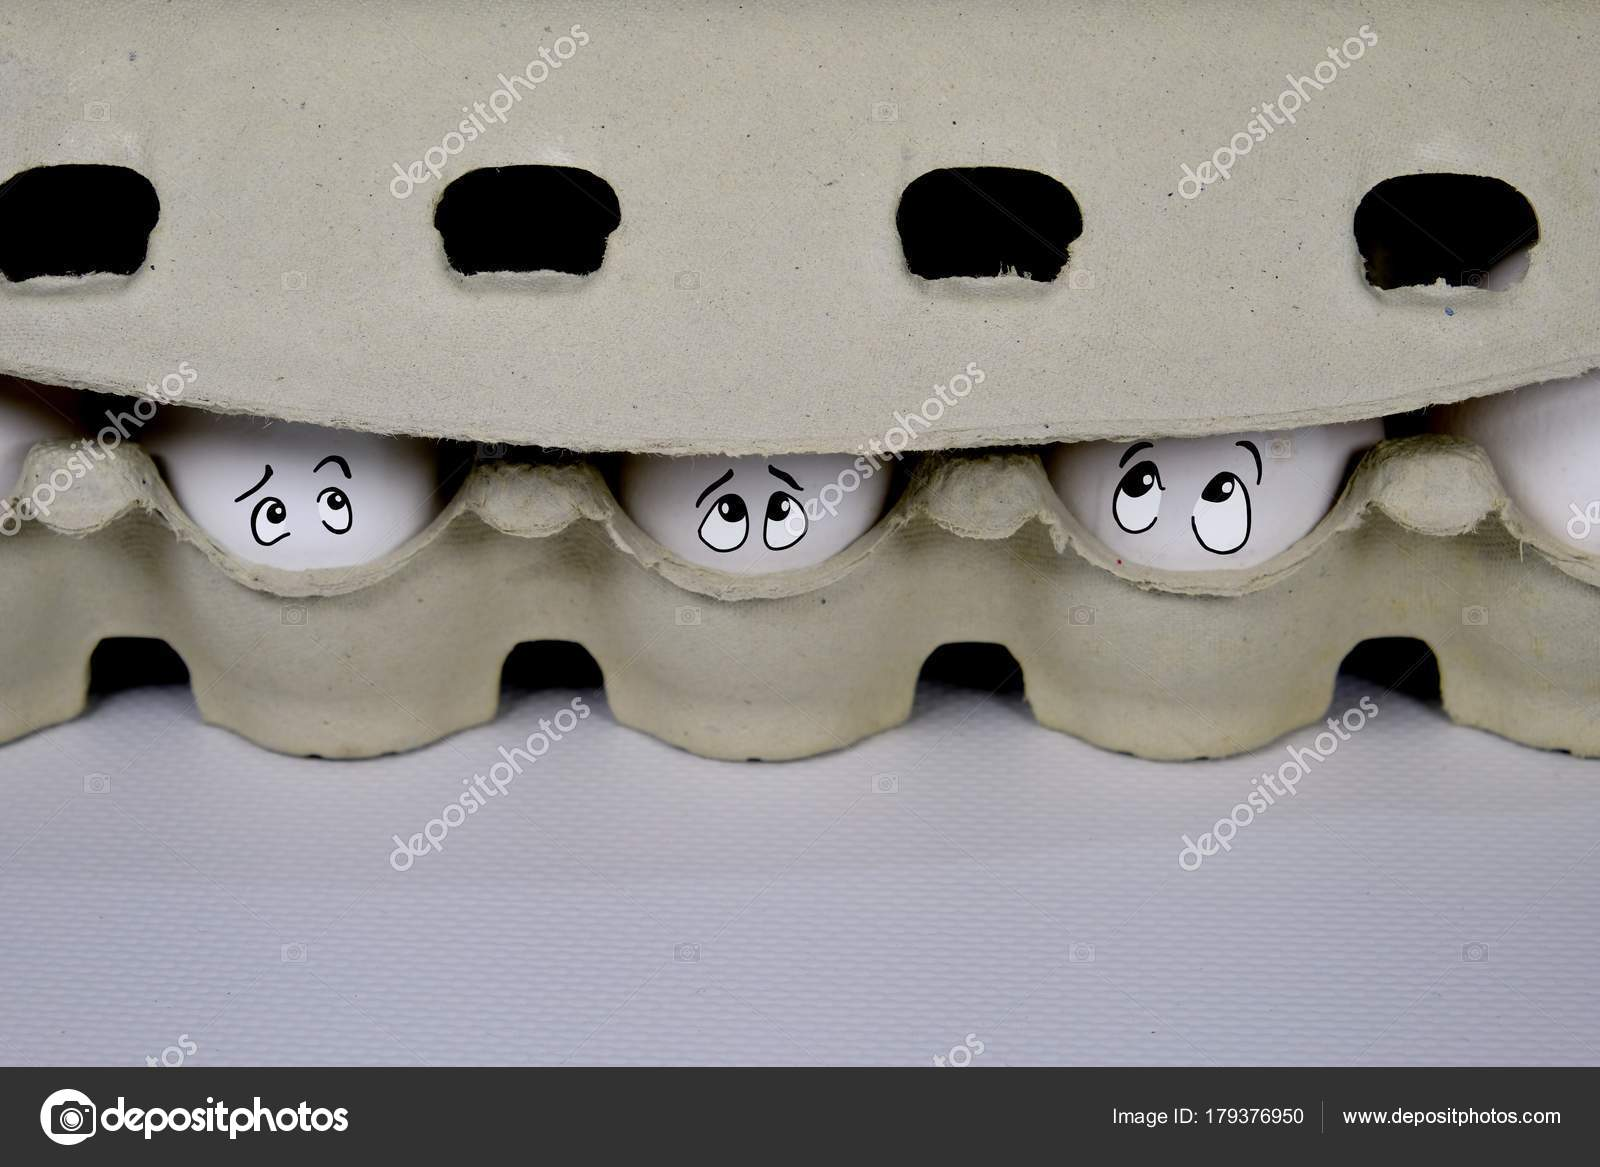 Eggs Peeking Out Of The Box A Symbol Of Quarantine Stock Photo